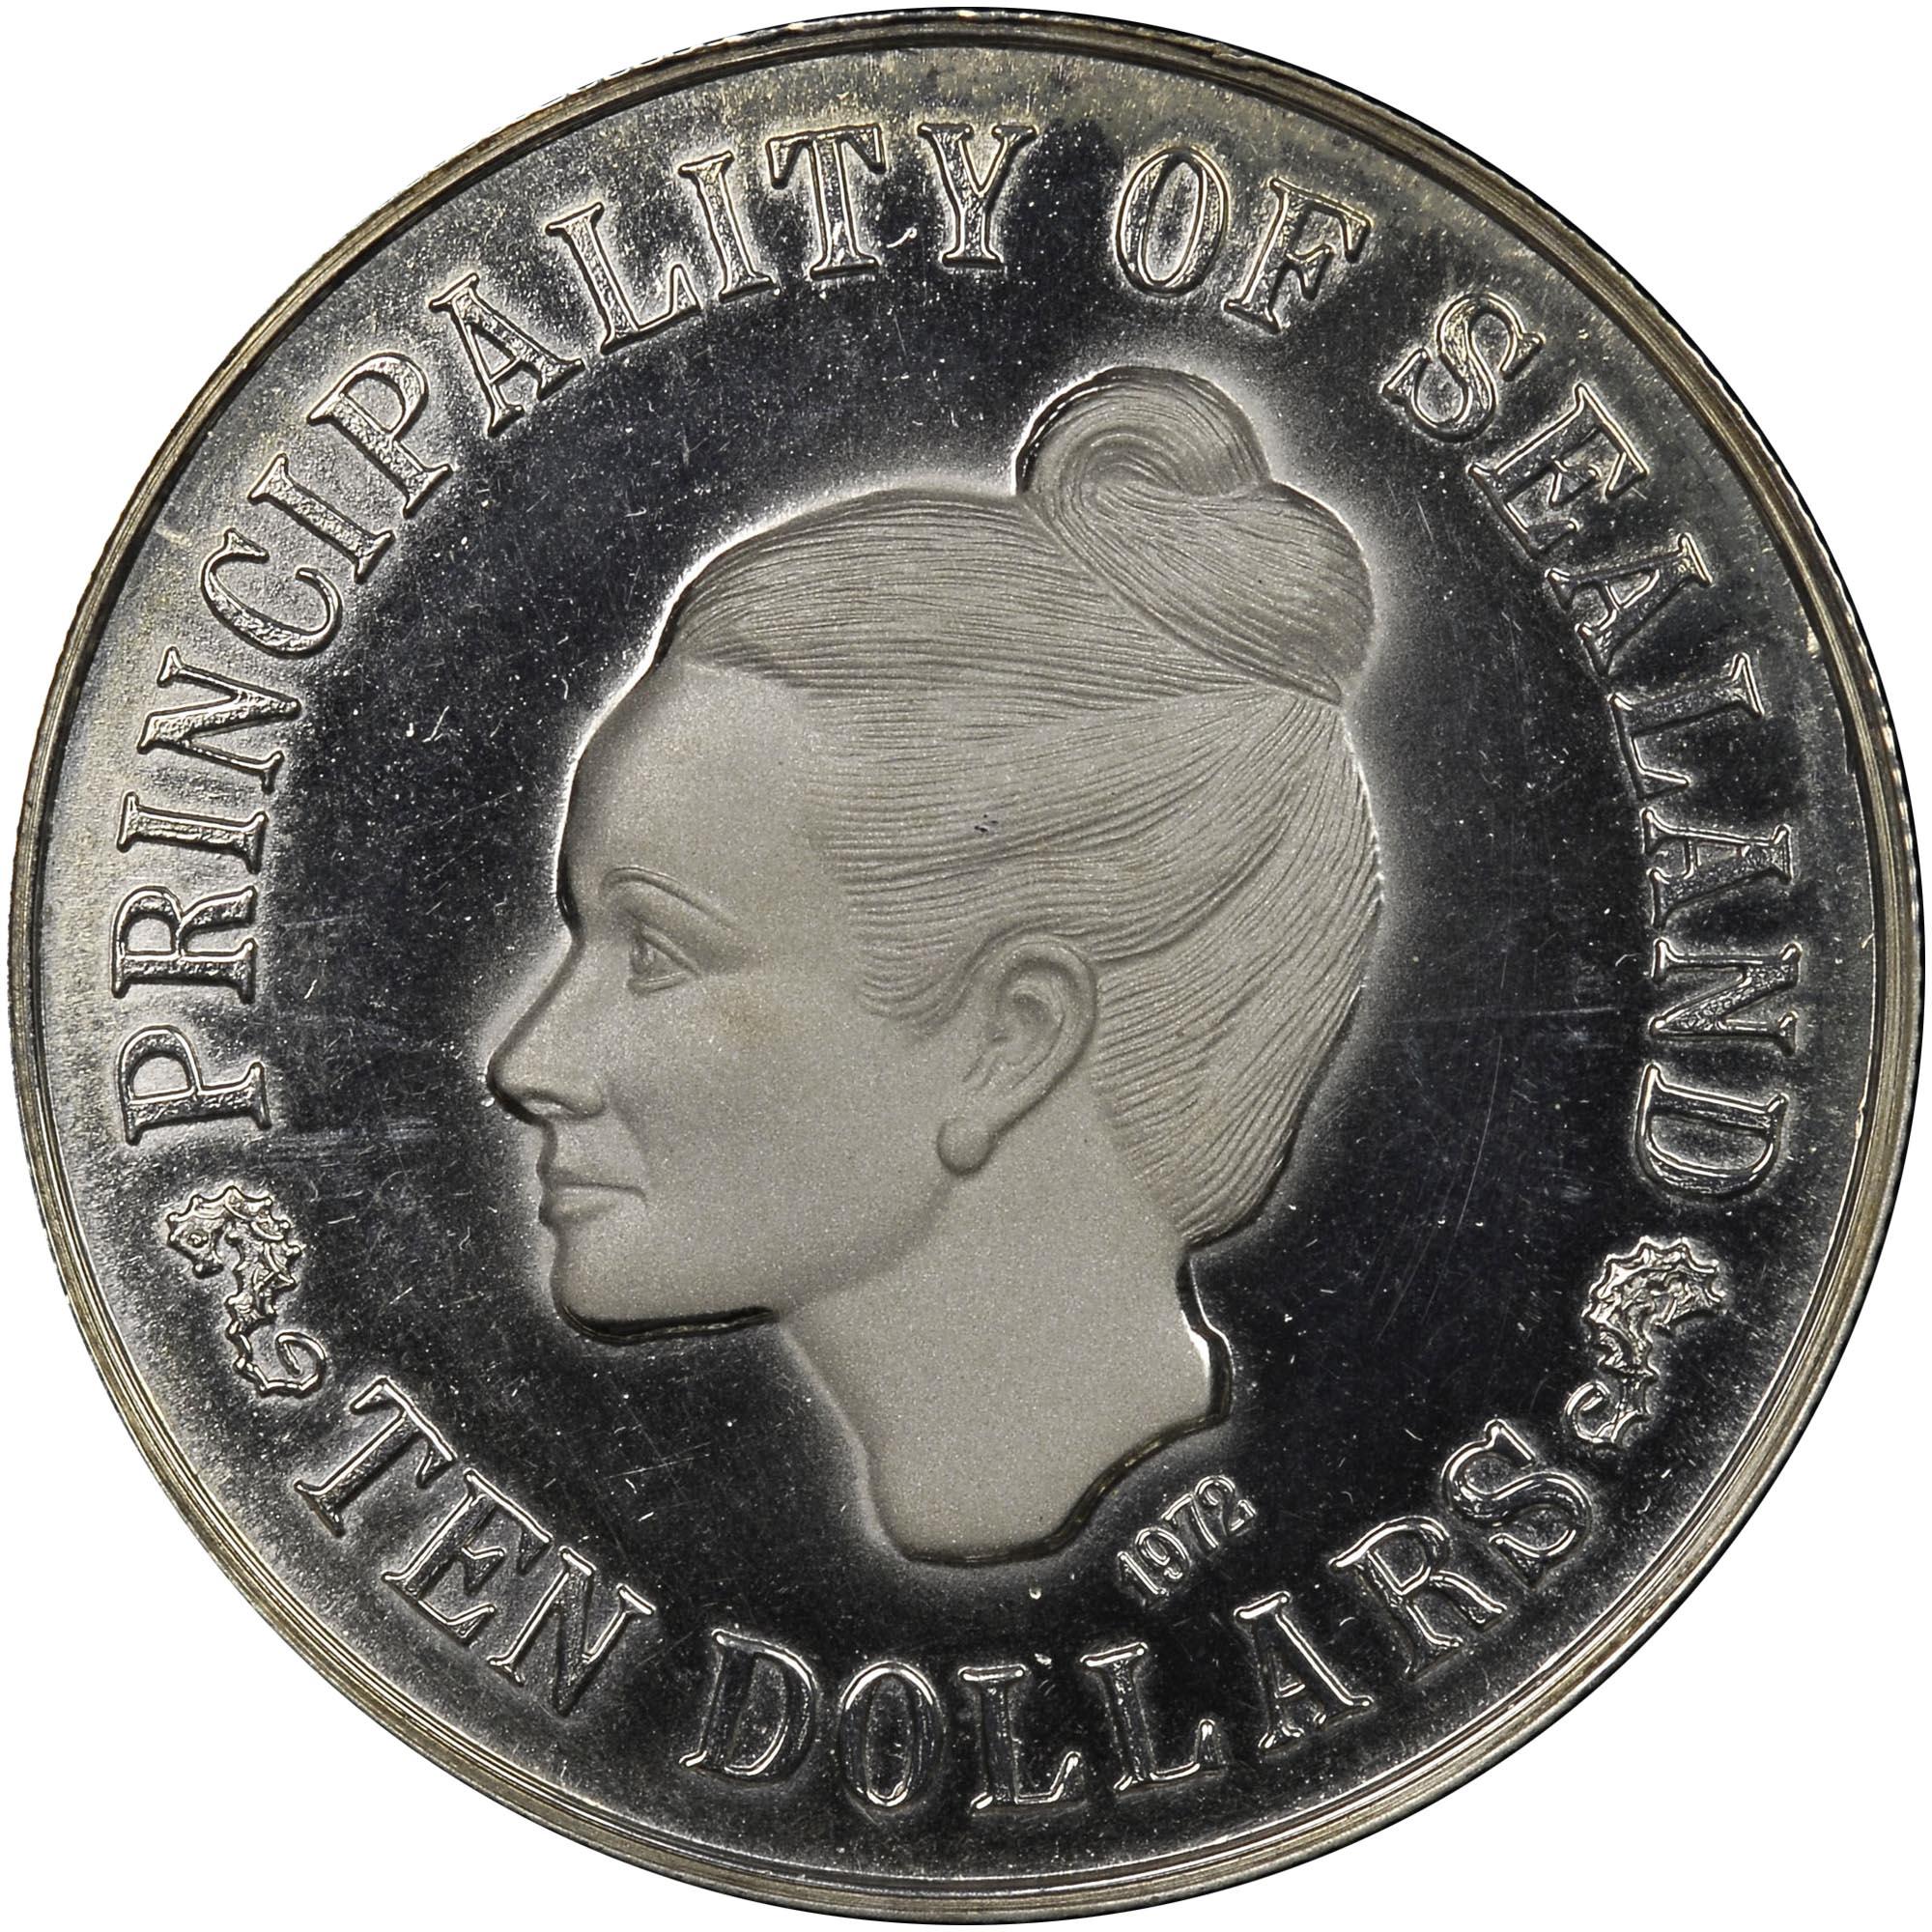 Sealand 10 Dollars obverse